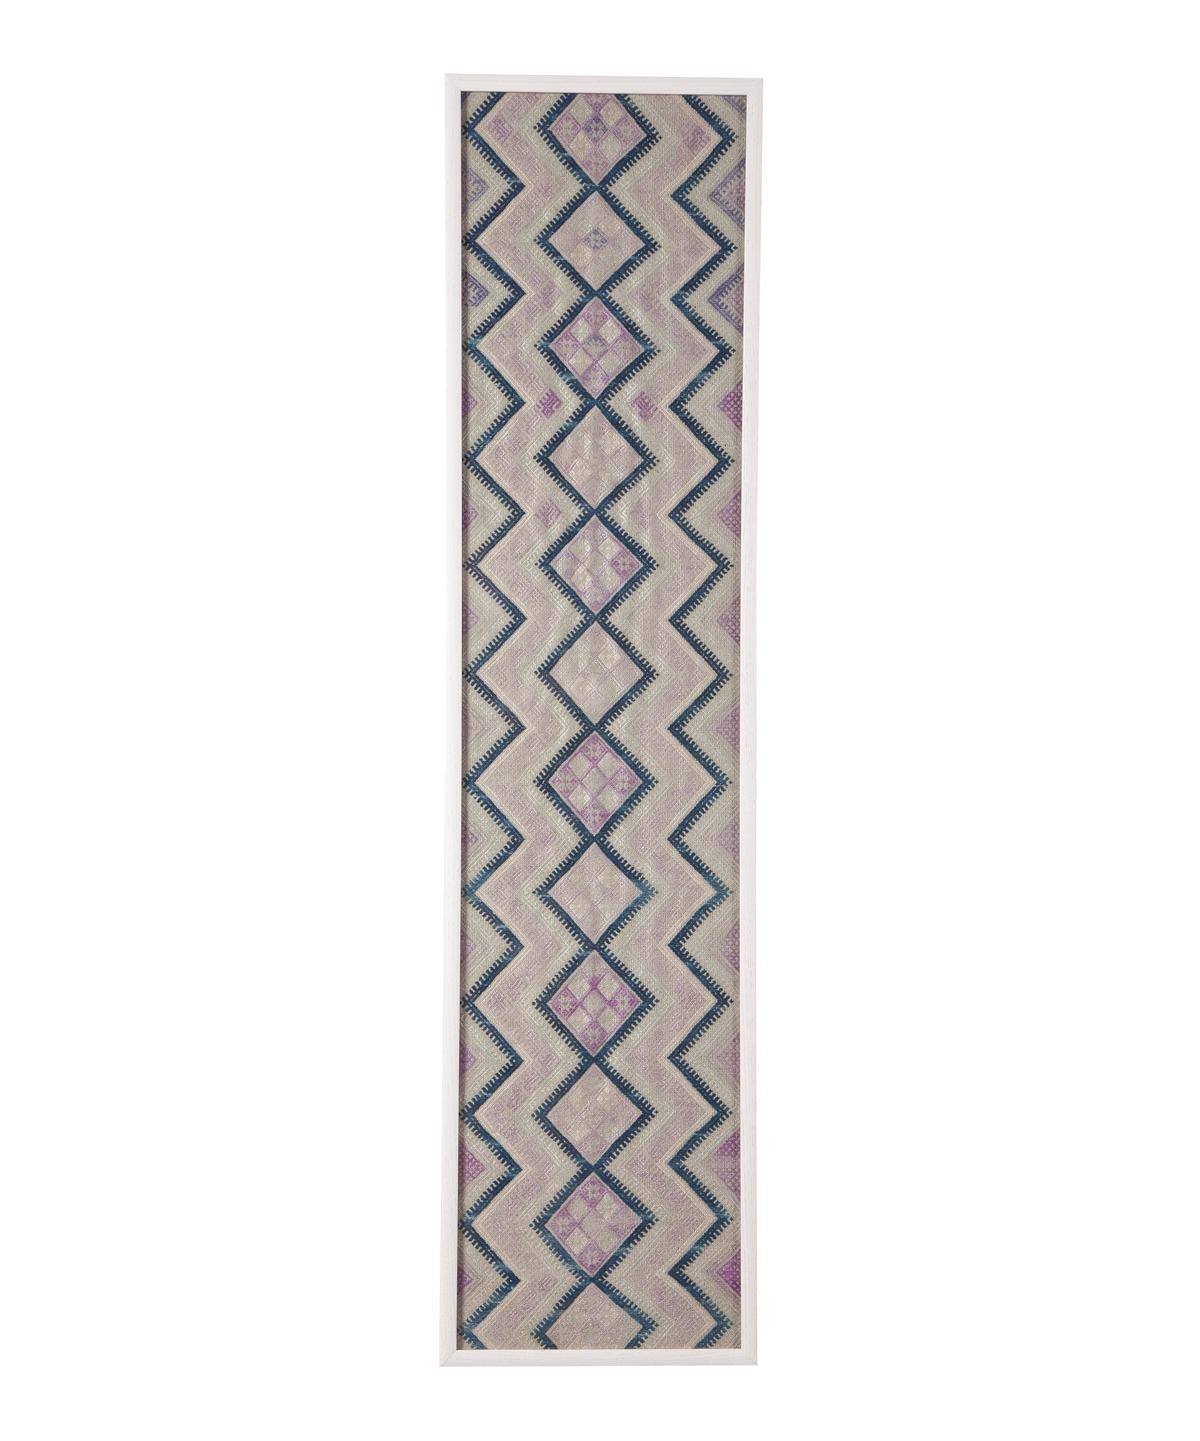 Yao Ceremonial Textile